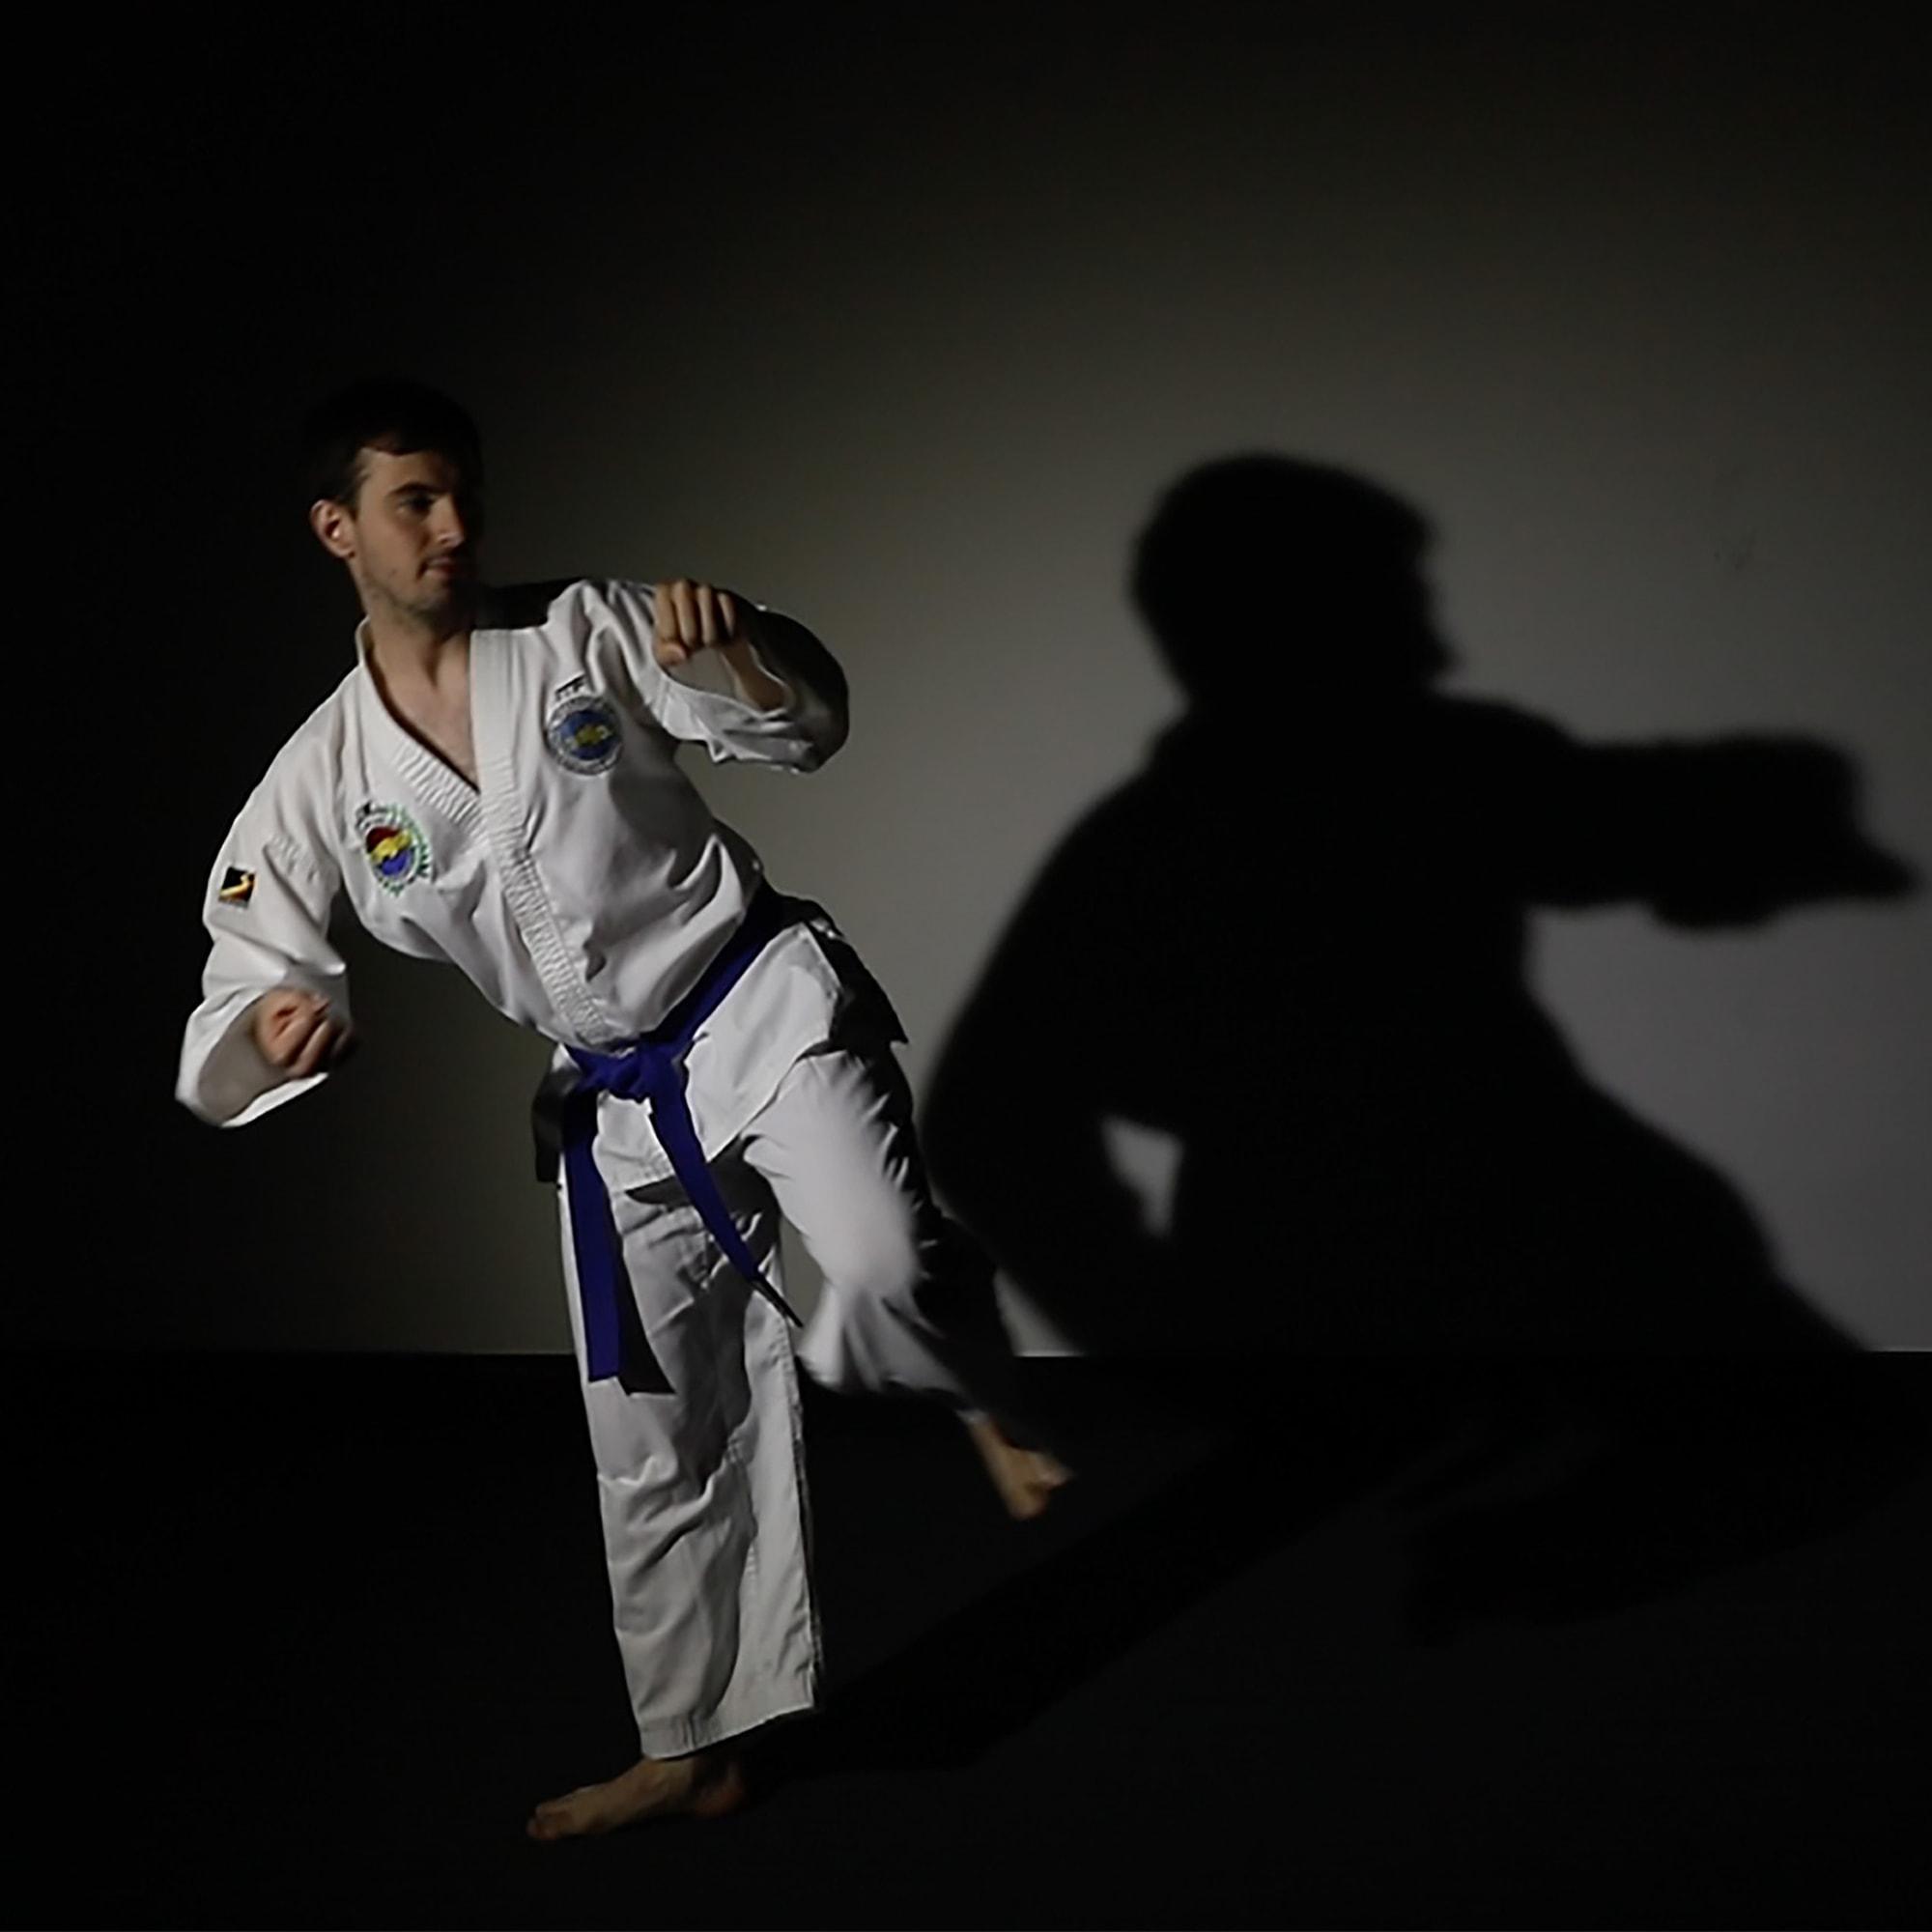 A man begins a martial arts kicking movement